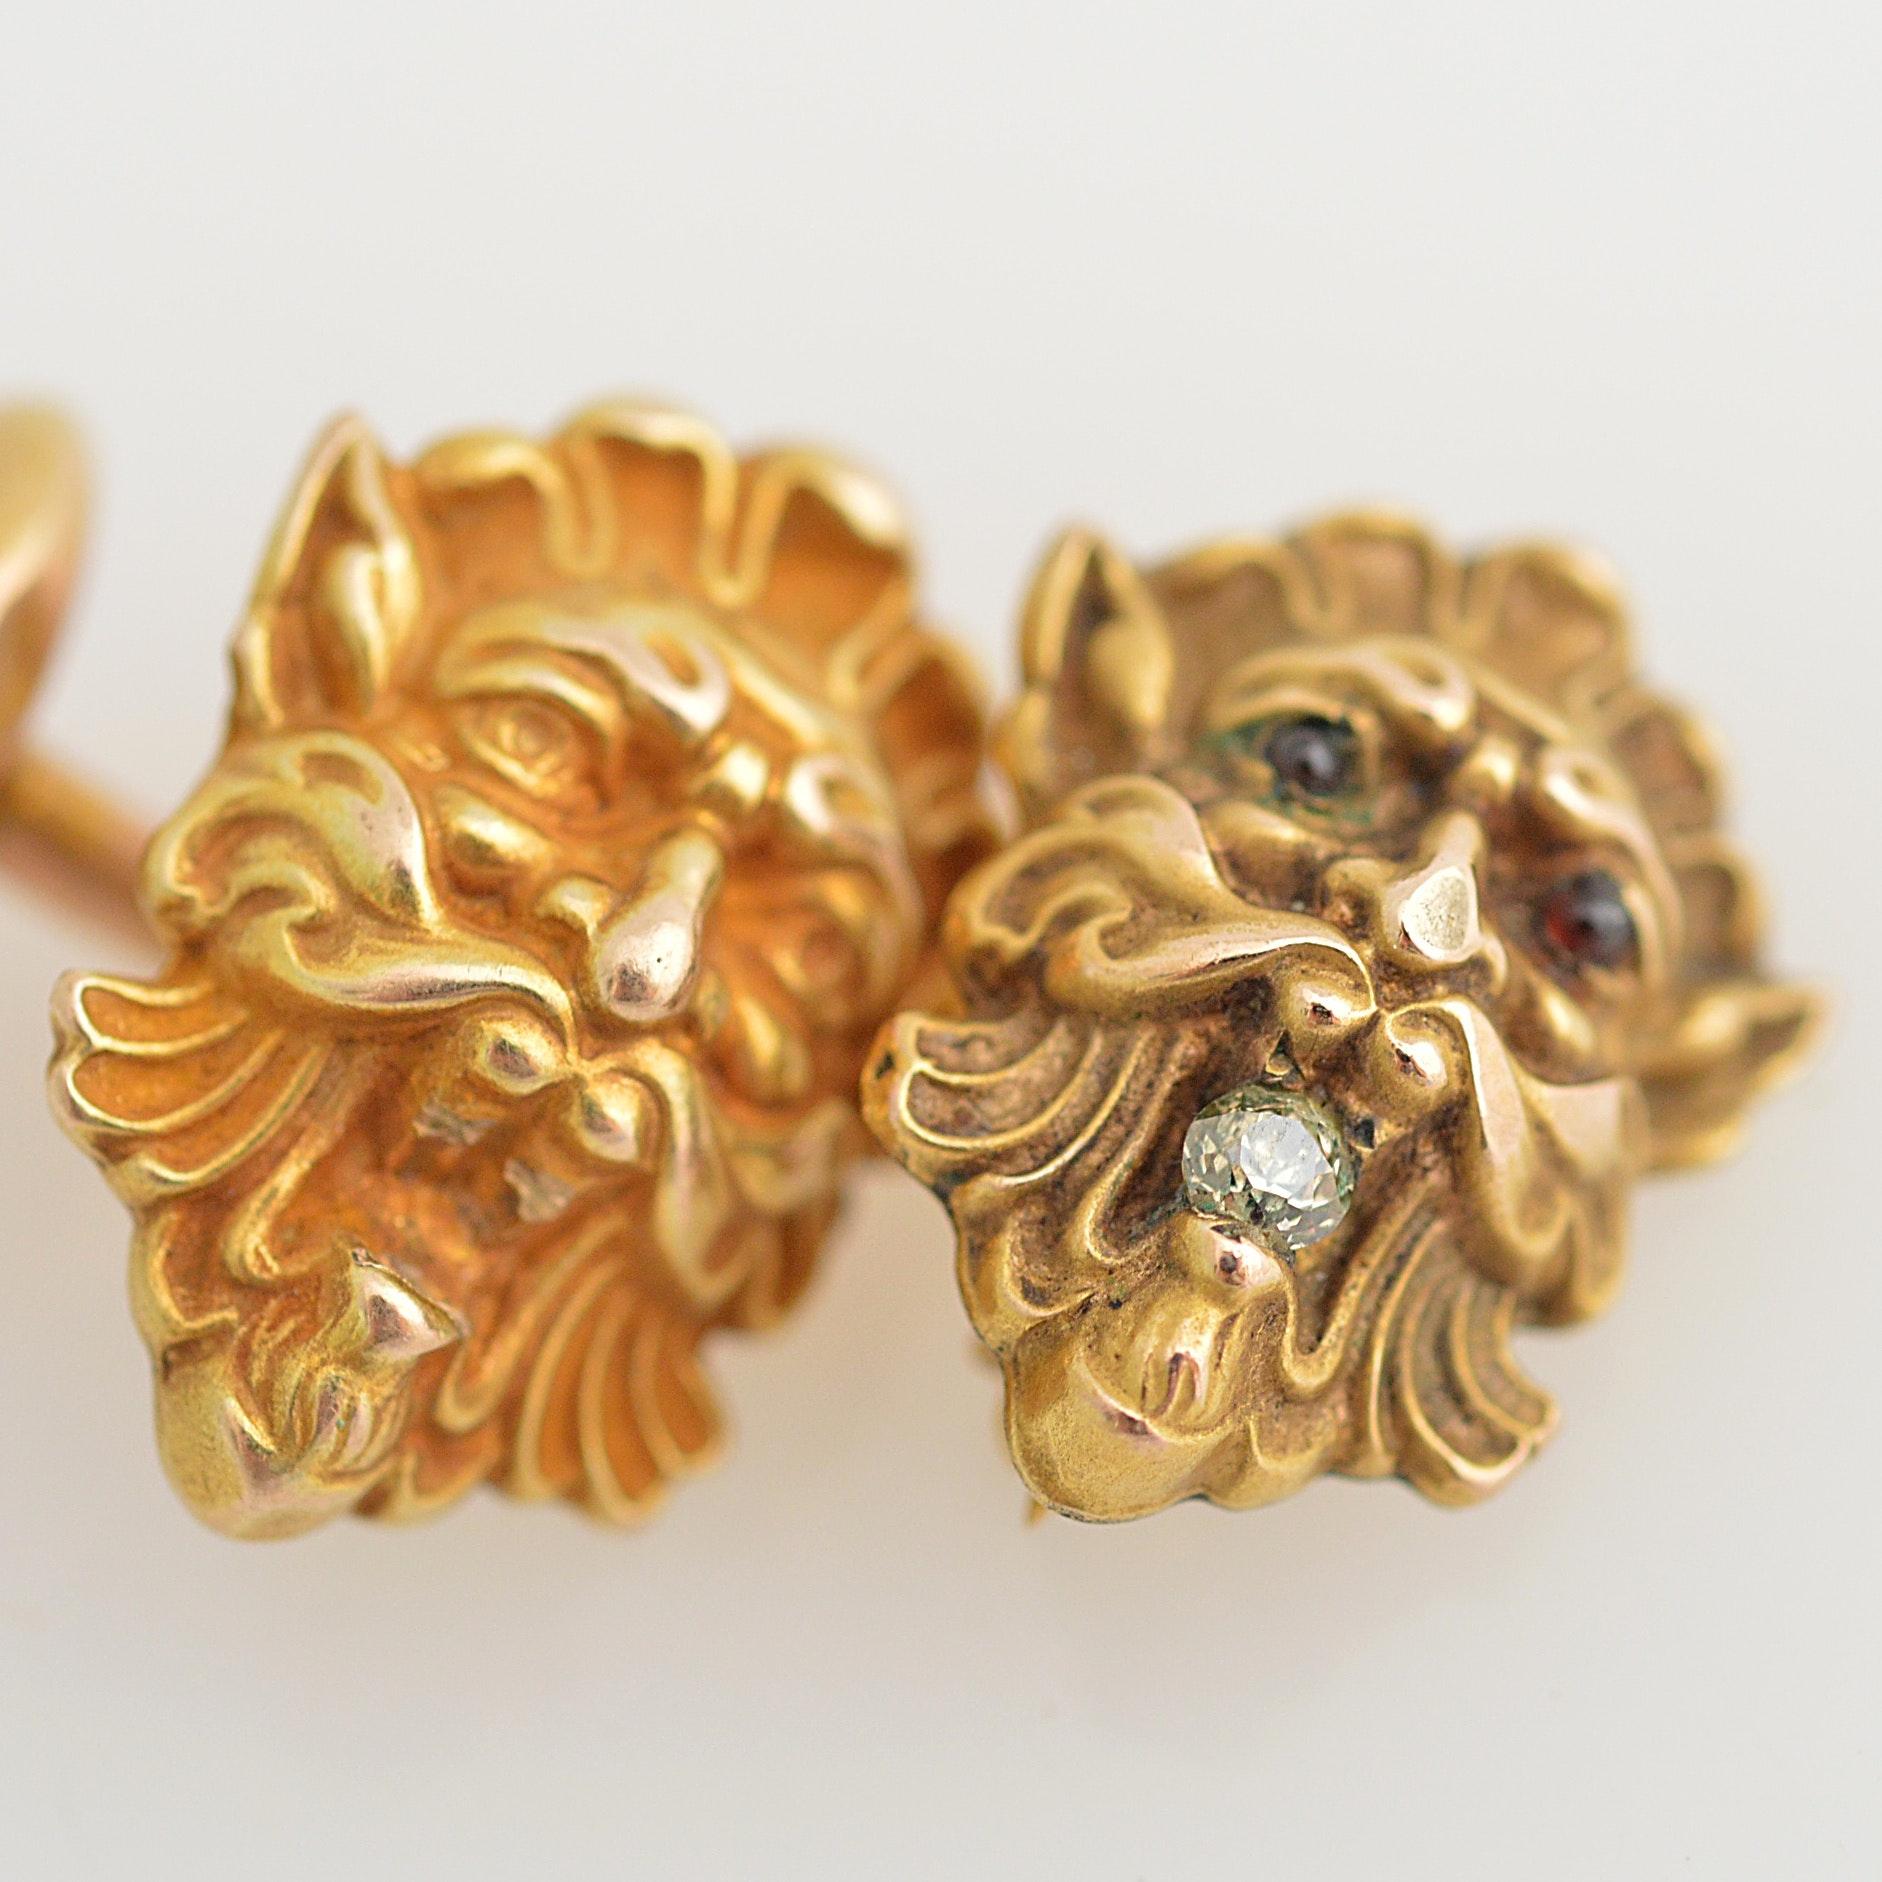 Aeolus 10K Yellow Gold Cufflink and 10K Yellow Gold Diamond Garnet Brooch